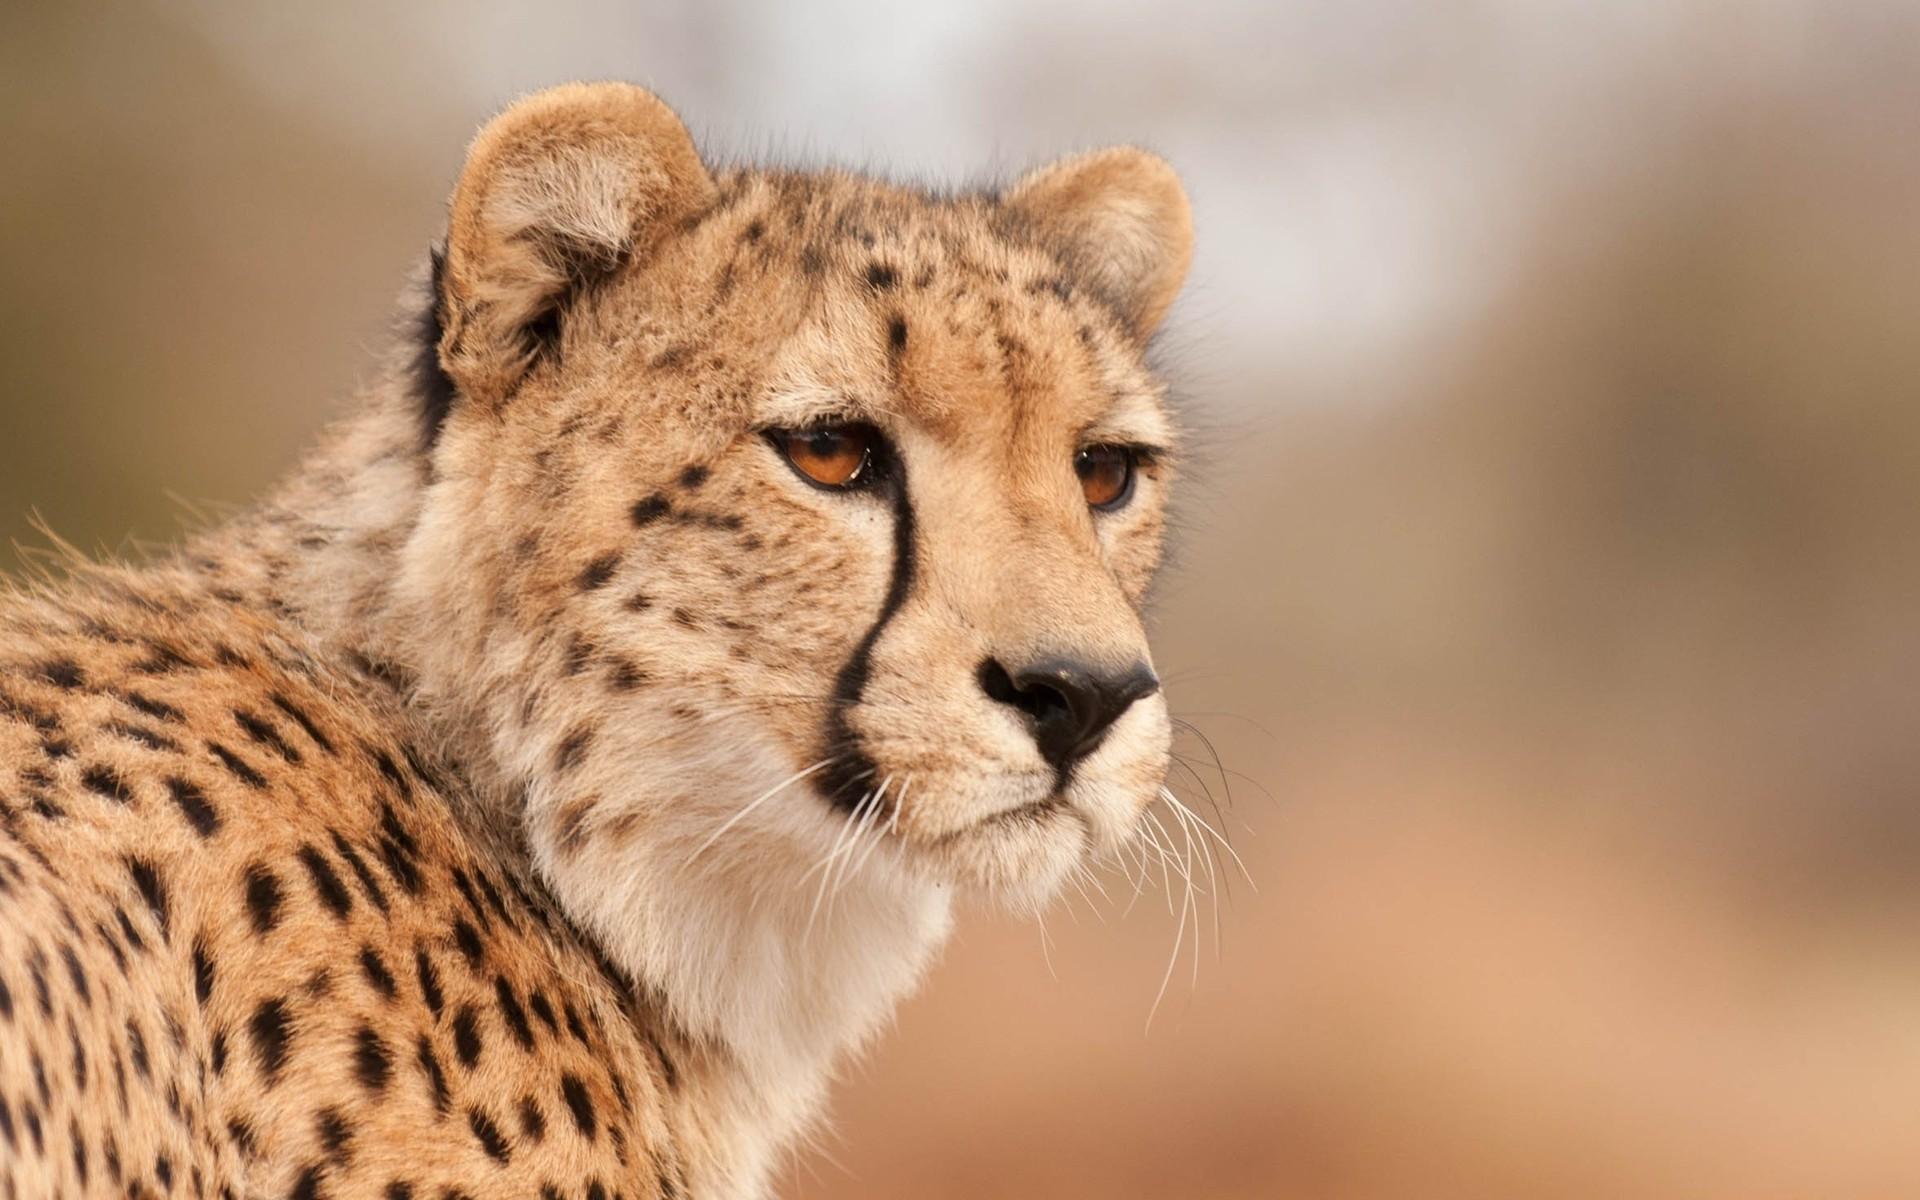 Res: 1920x1200, Cheetah Wallpapers 13 - 1920 X 1200